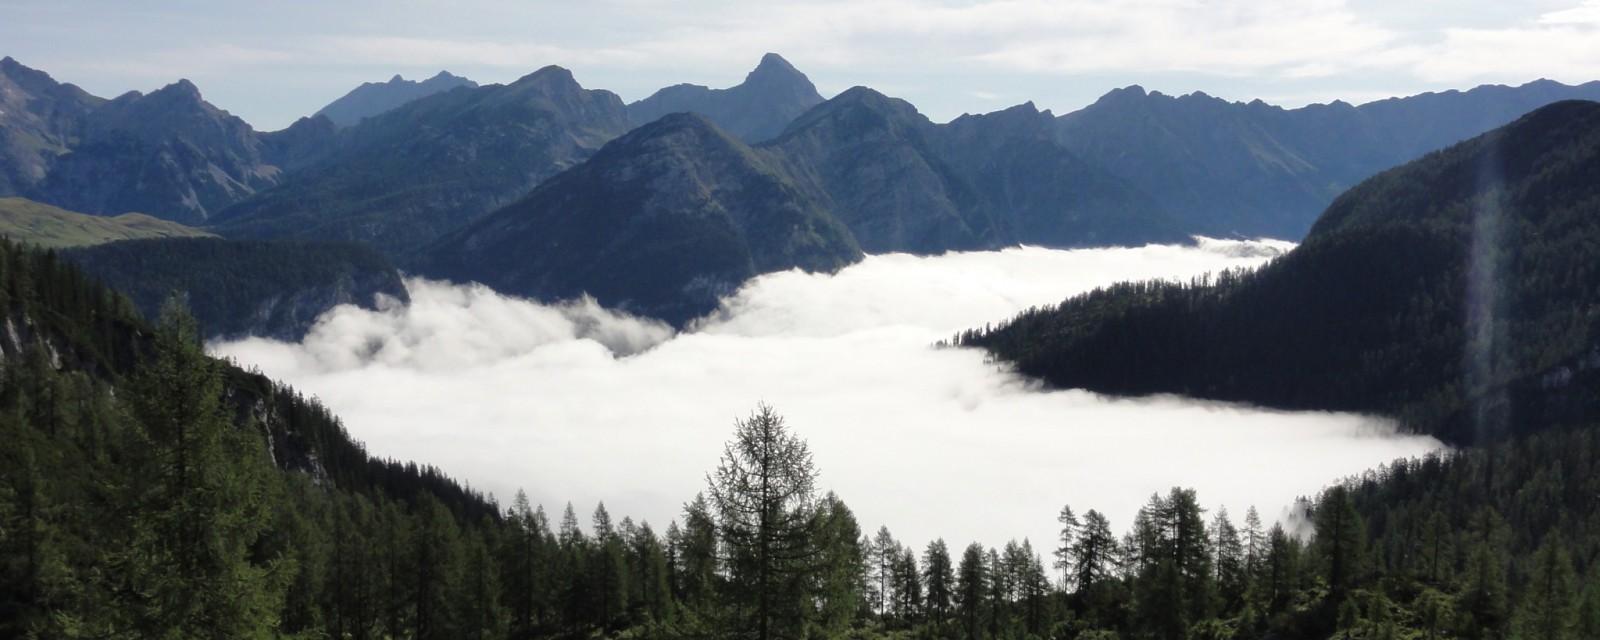 Arnoweg: Wolkenmeer über dem Saalachtal